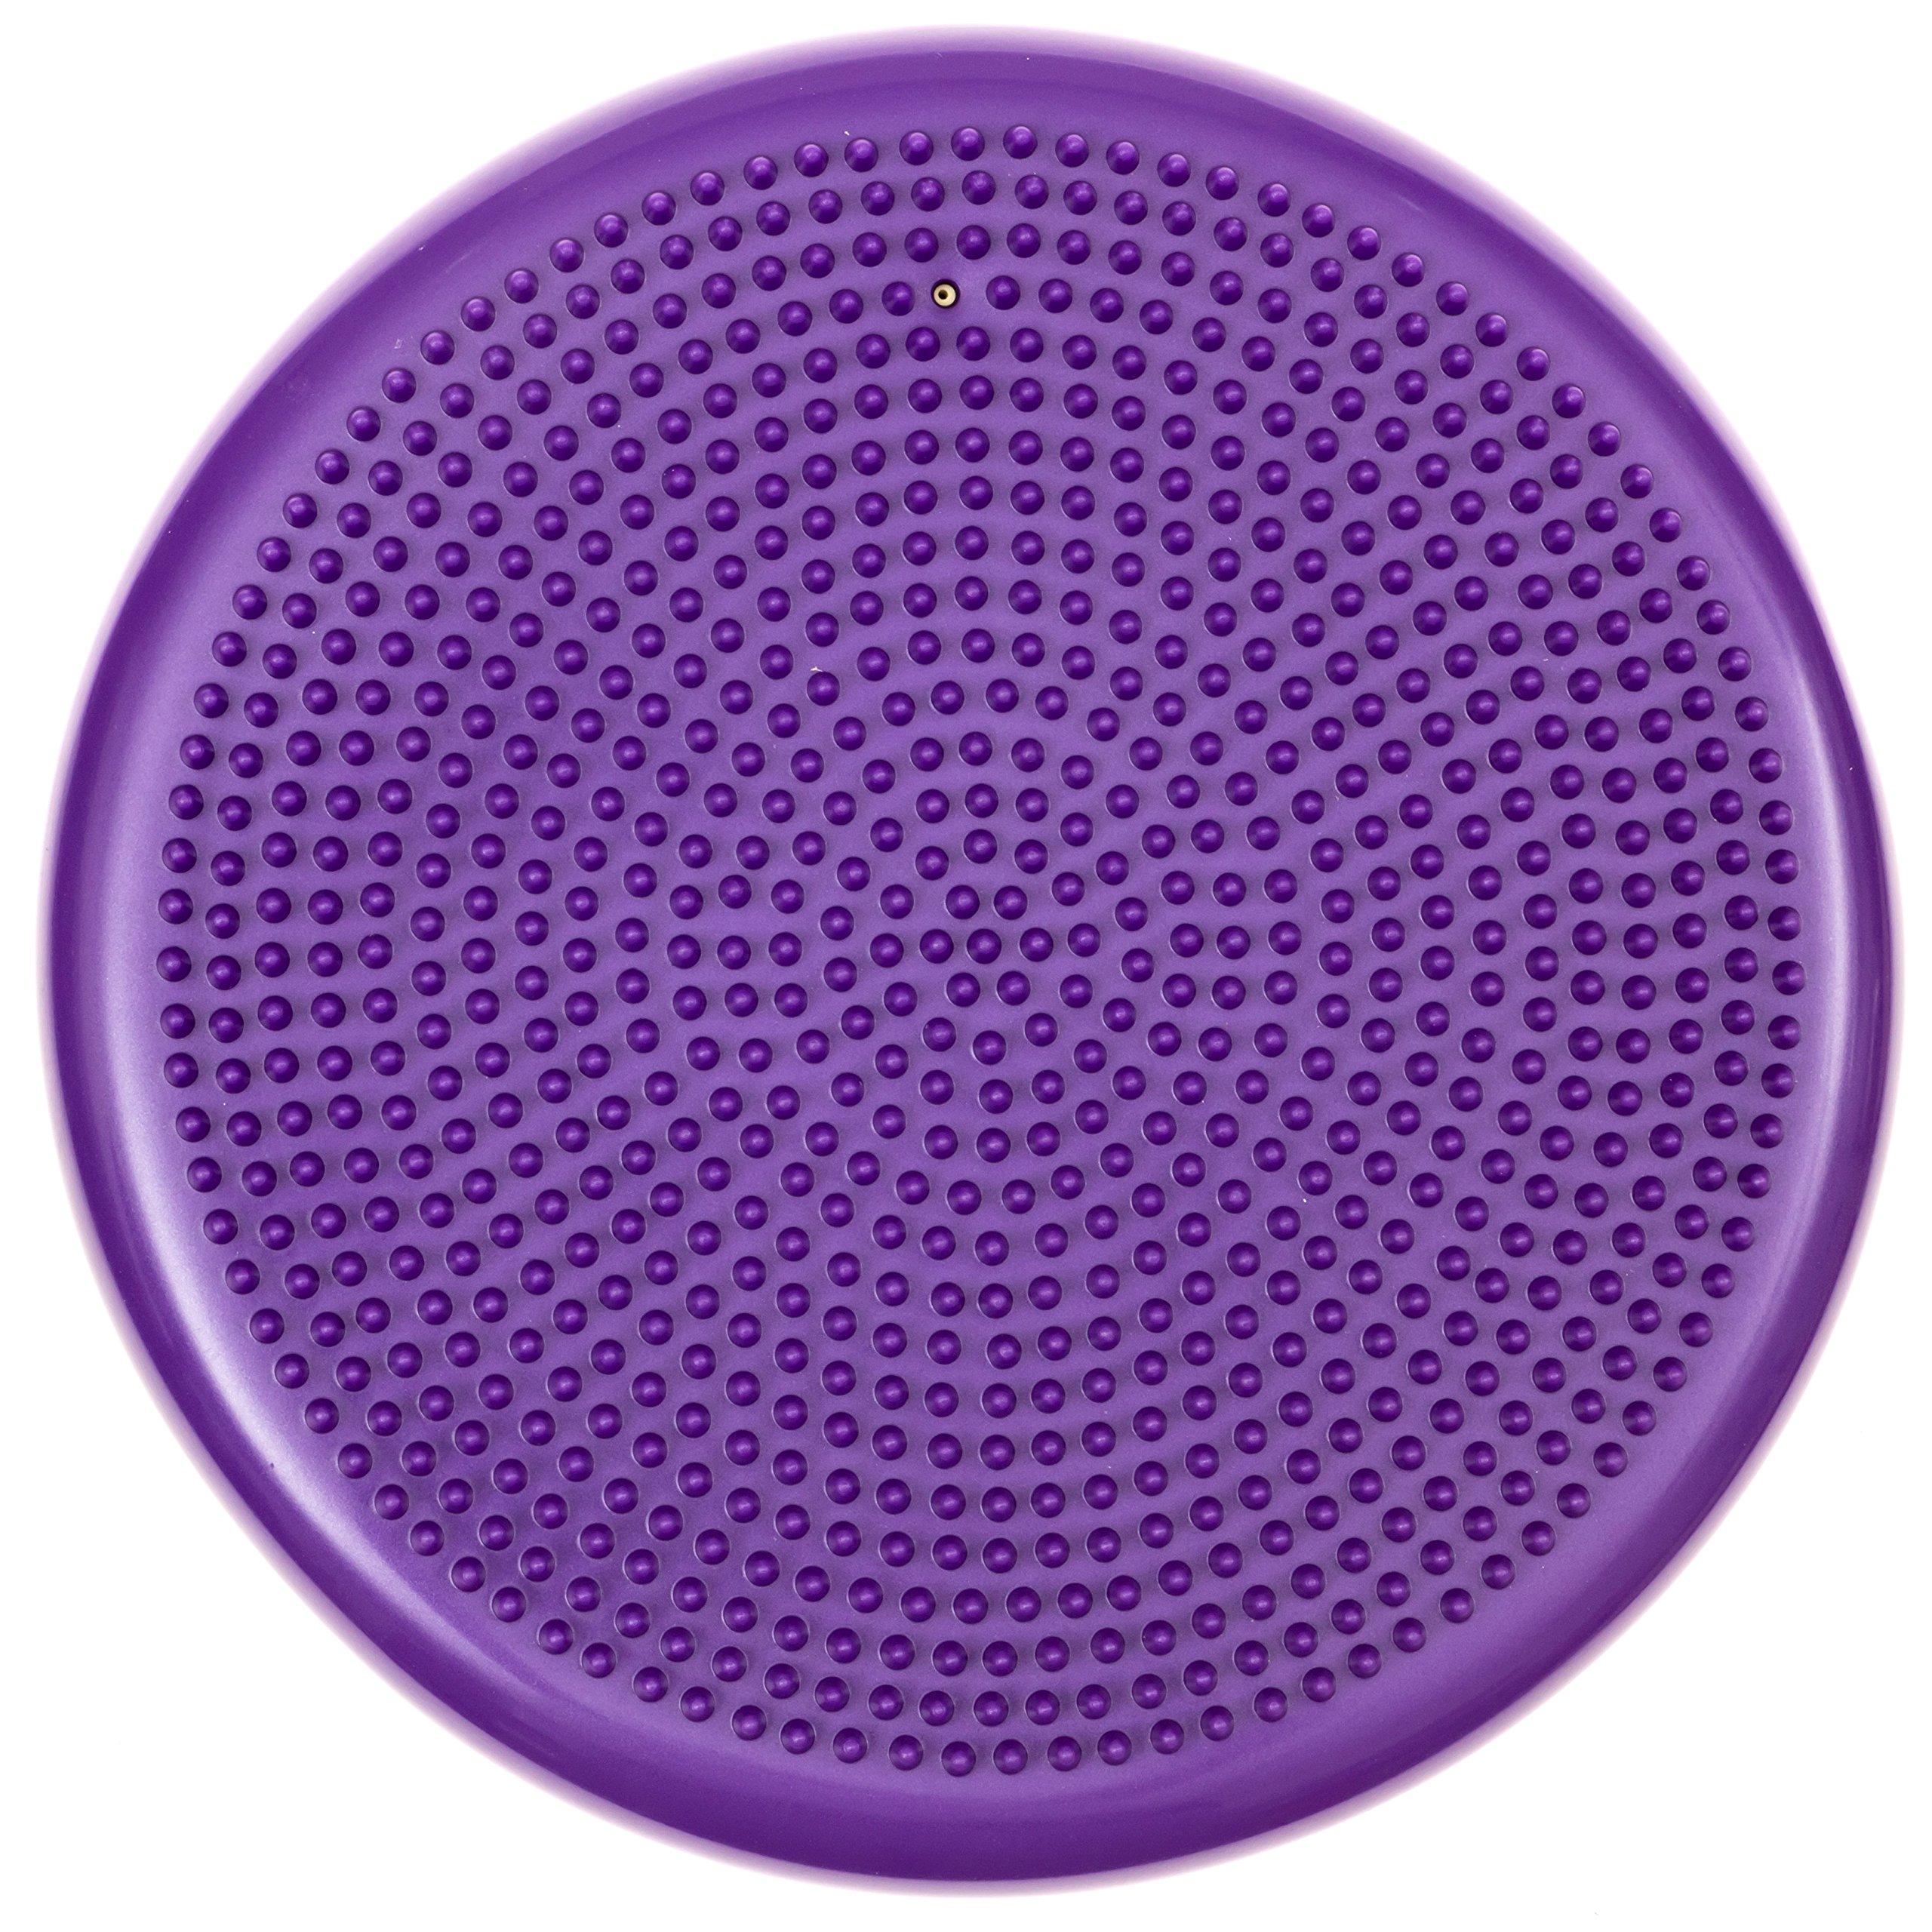 bintiva round balance disc purple 33cm by bintiva (Image #1)